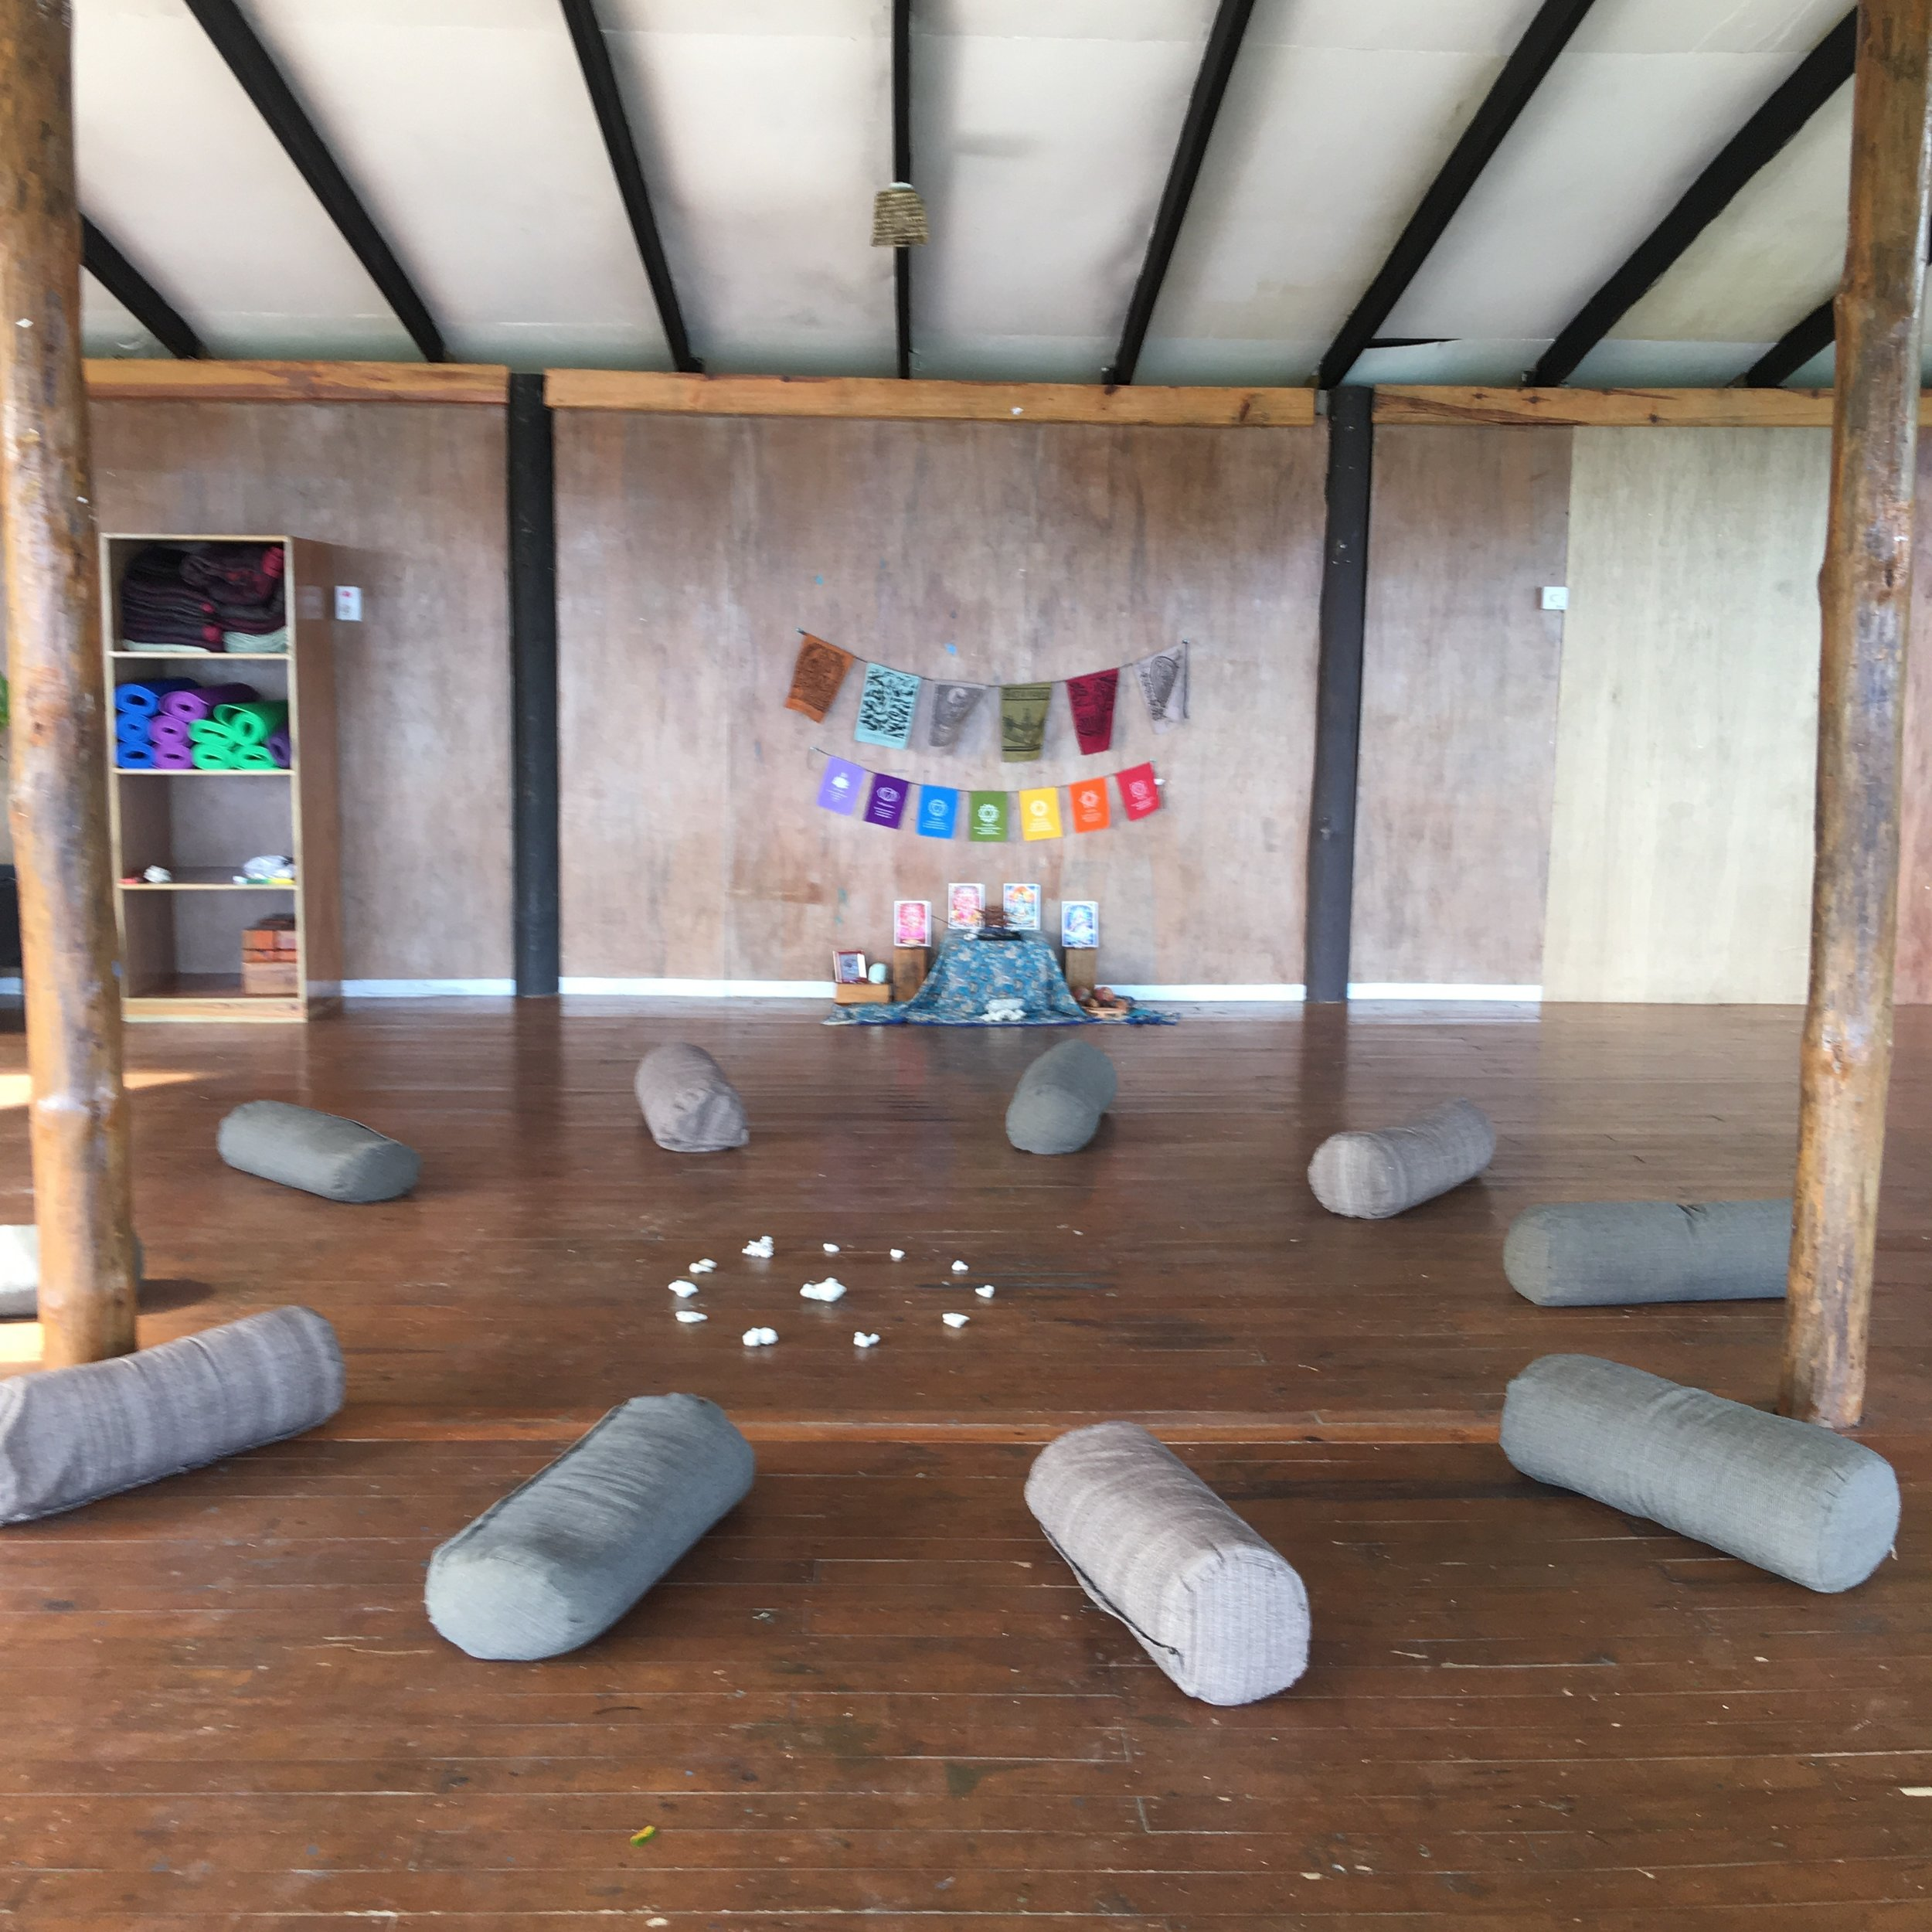 Setting up the sacred circle at my 2nd Facilitating Program with Sadhana Yoga School in Savusavua, Fiji